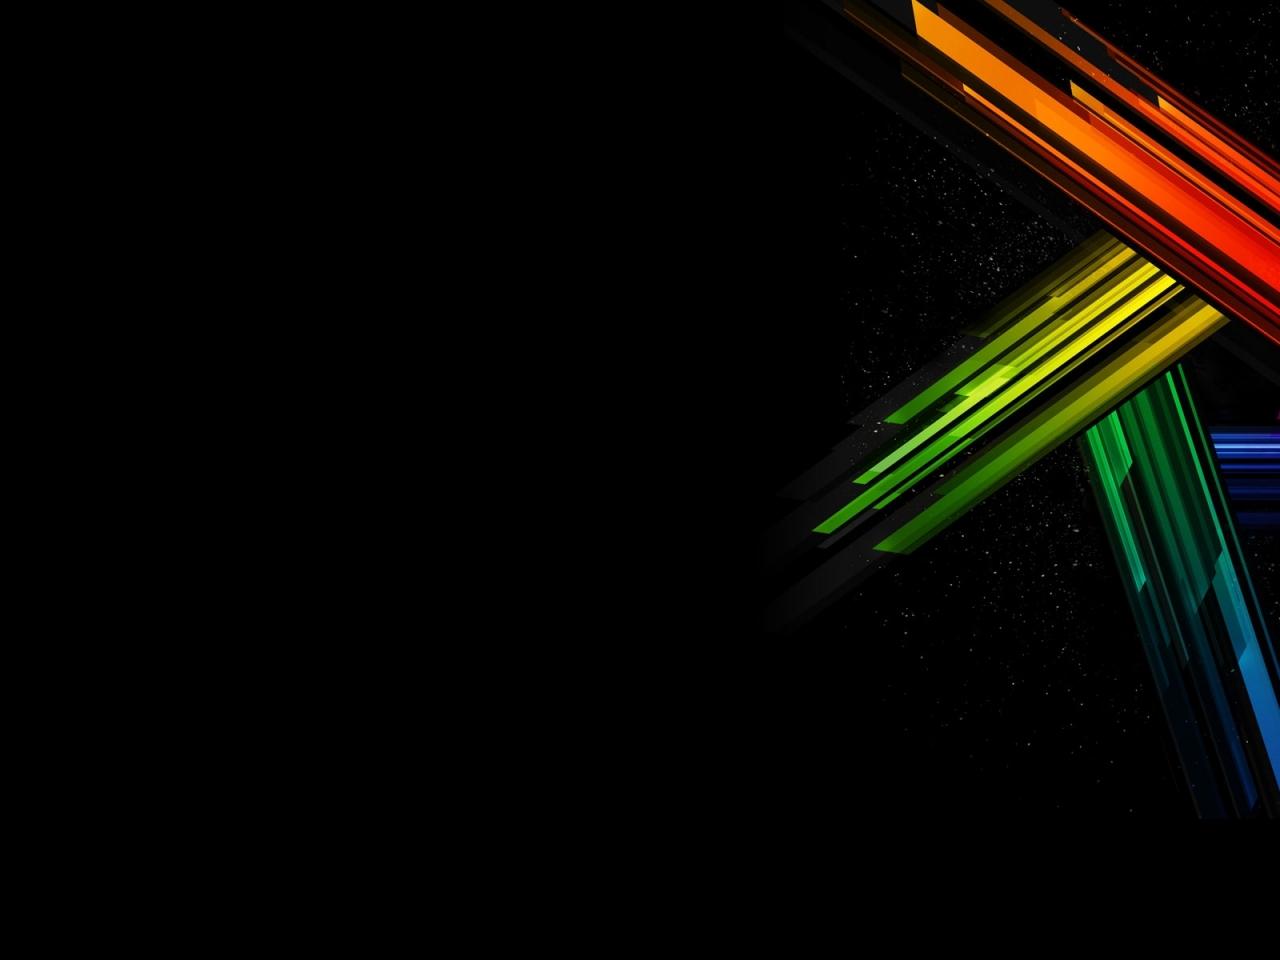 Free Download Live Black Wallpaper Iphone 5 Hd 10895 Hd